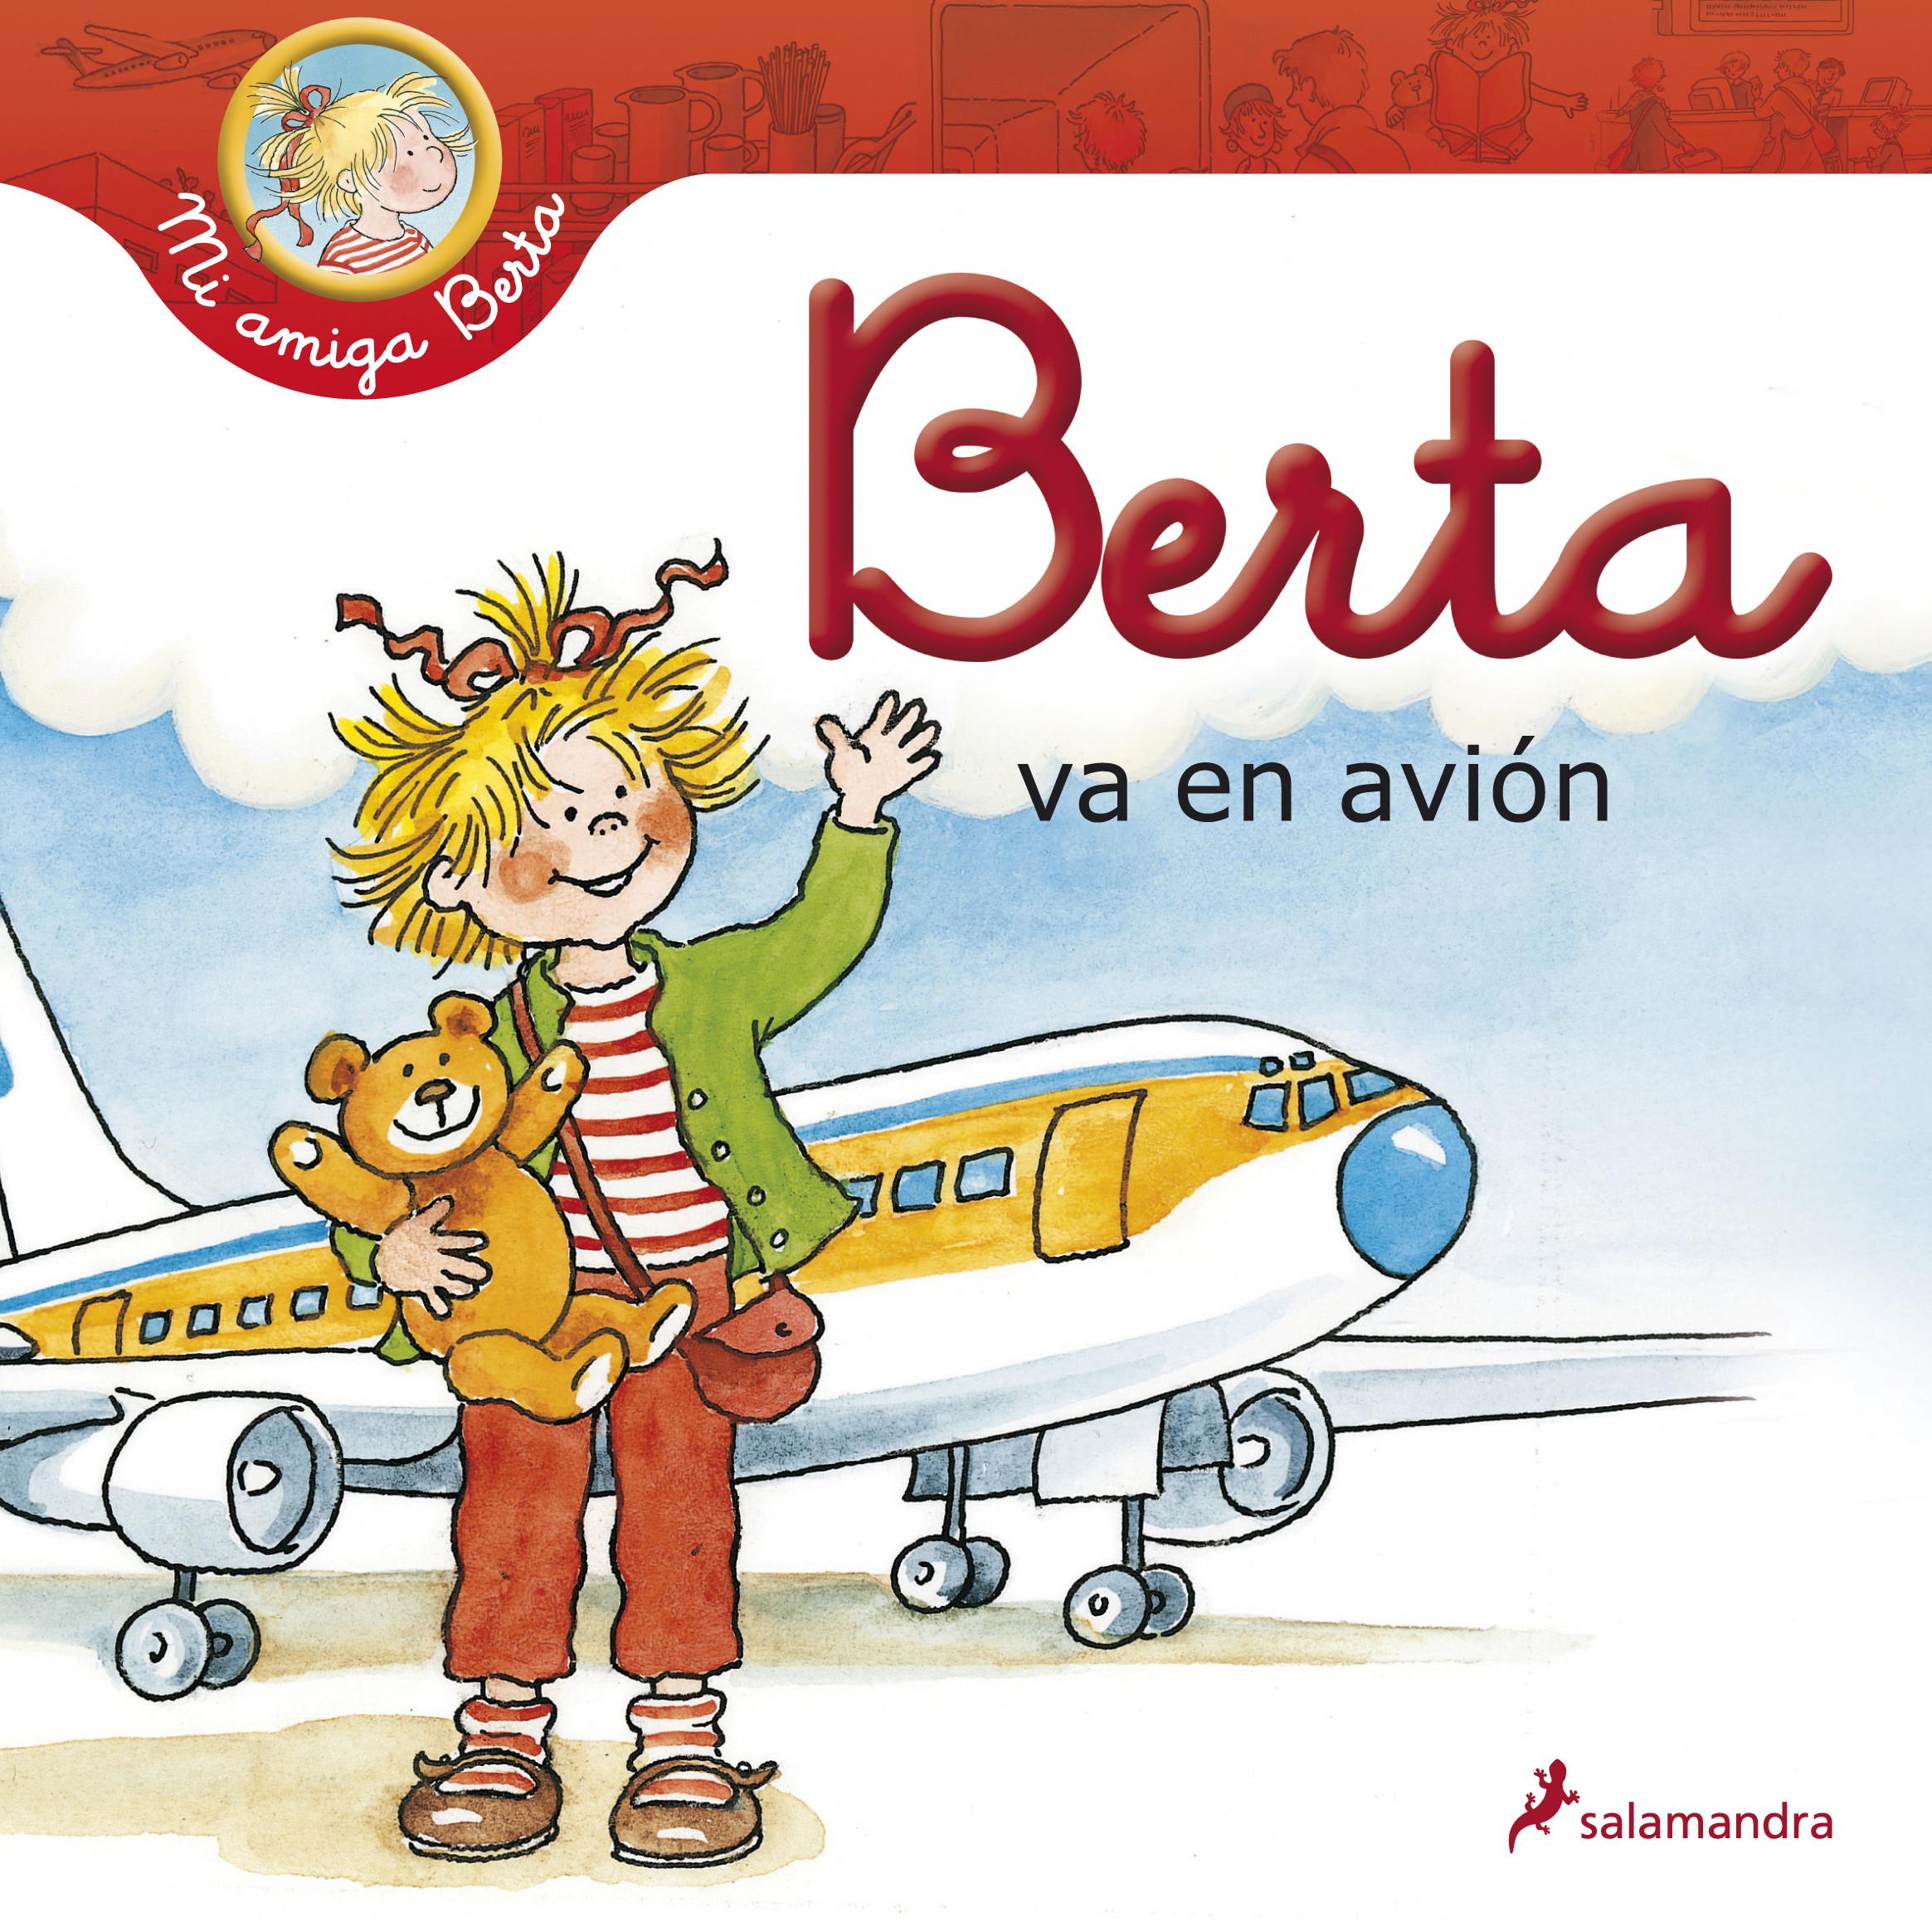 Berta va en avión